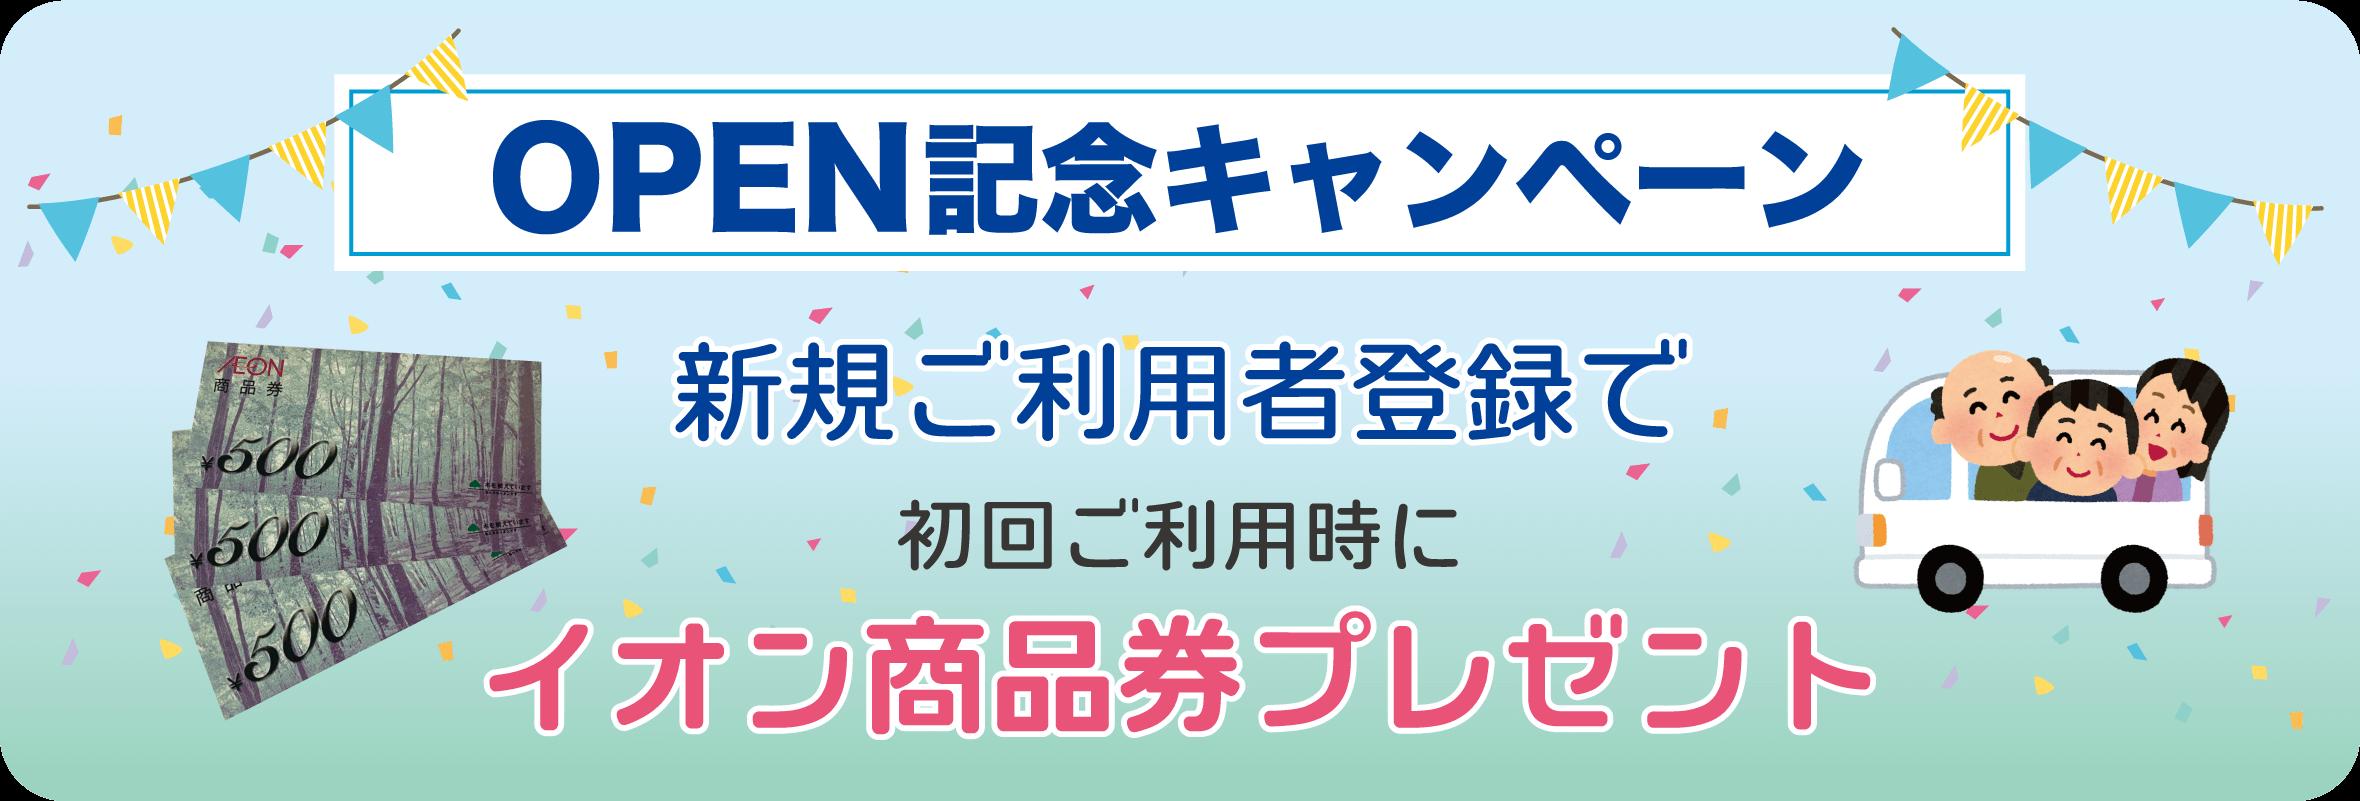 OPEN記念キャンペーン 新規ご利用者登録で初回ご利用時にイオン商品券プレゼント